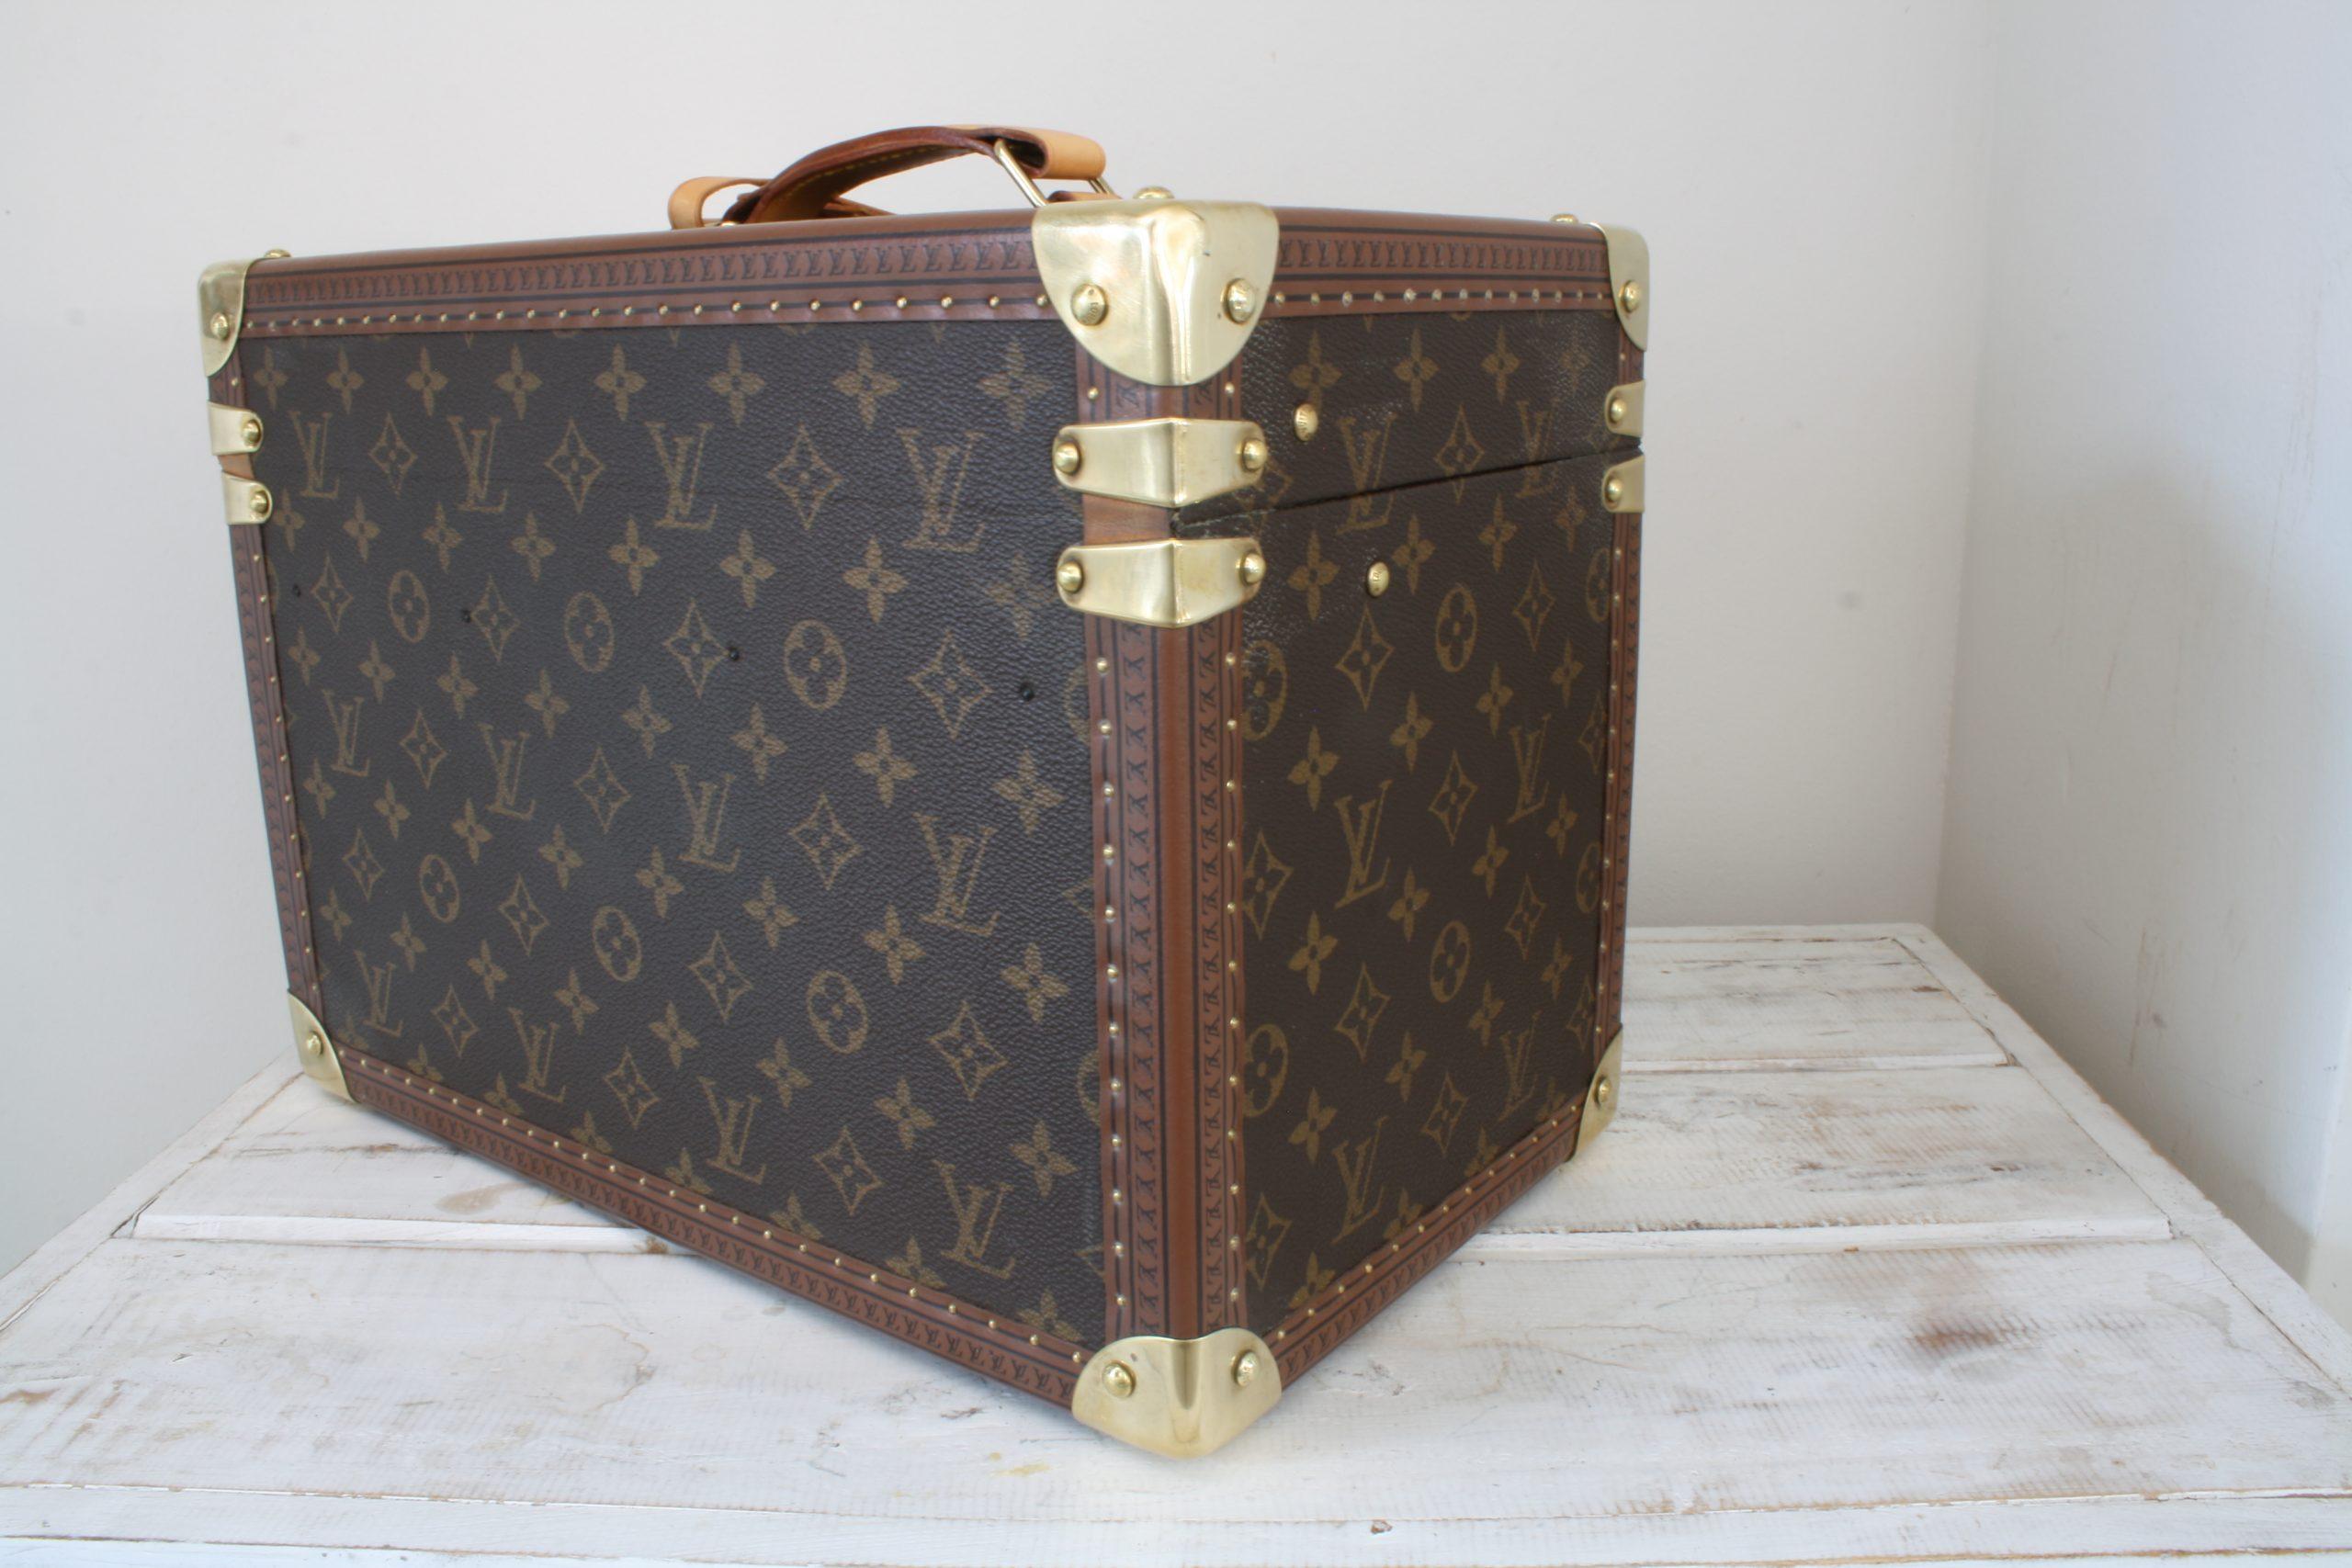 vintage-louis-vuitton-large-vanity-case-back-side-left